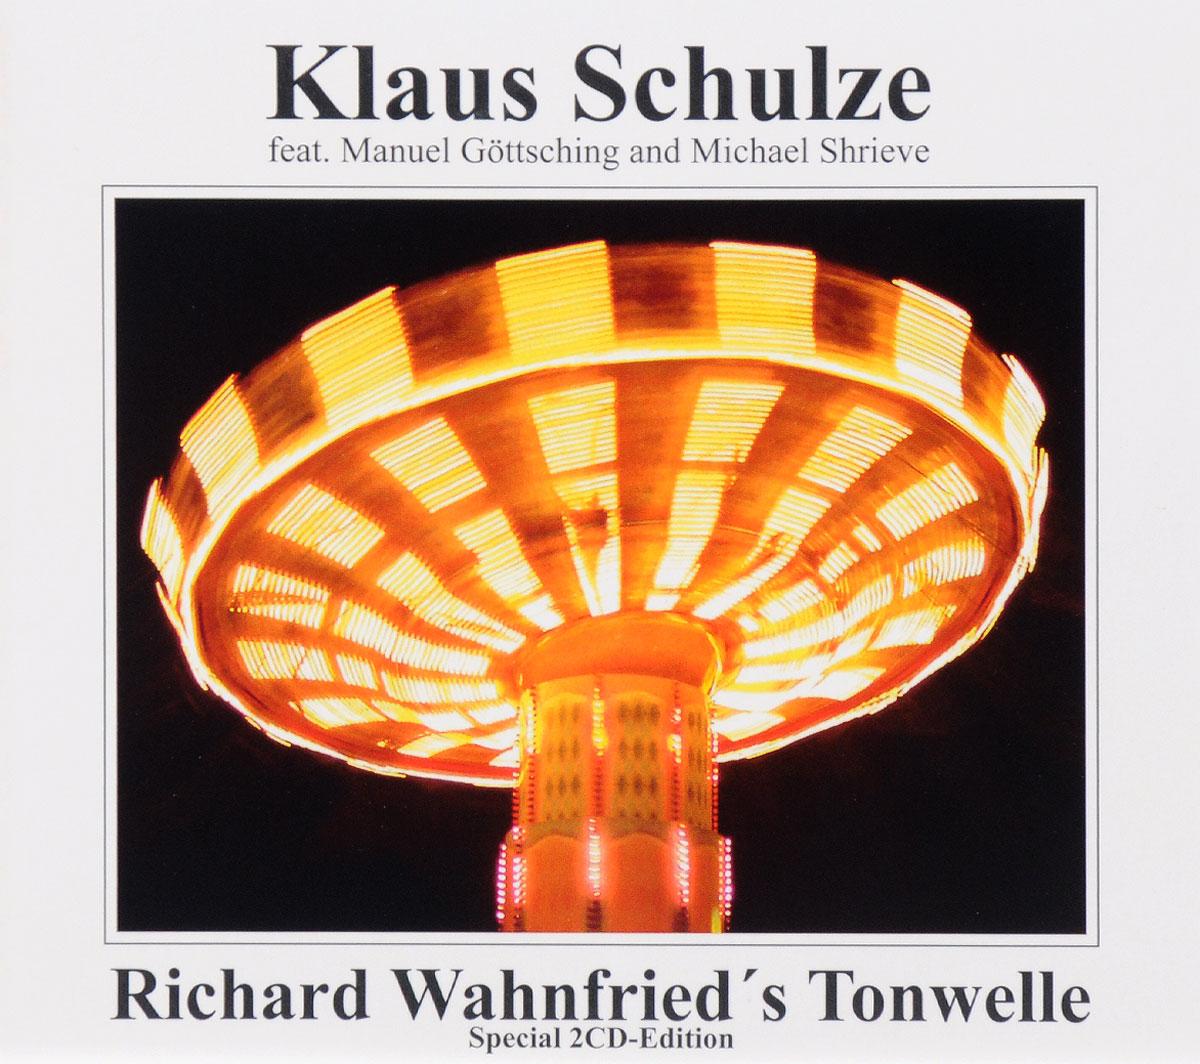 Клаус Шульце Klaus Schulze. Richard Wahnfried's Tonwelle (2 CD) клаус шульце klaus schulze dig it cd dvd